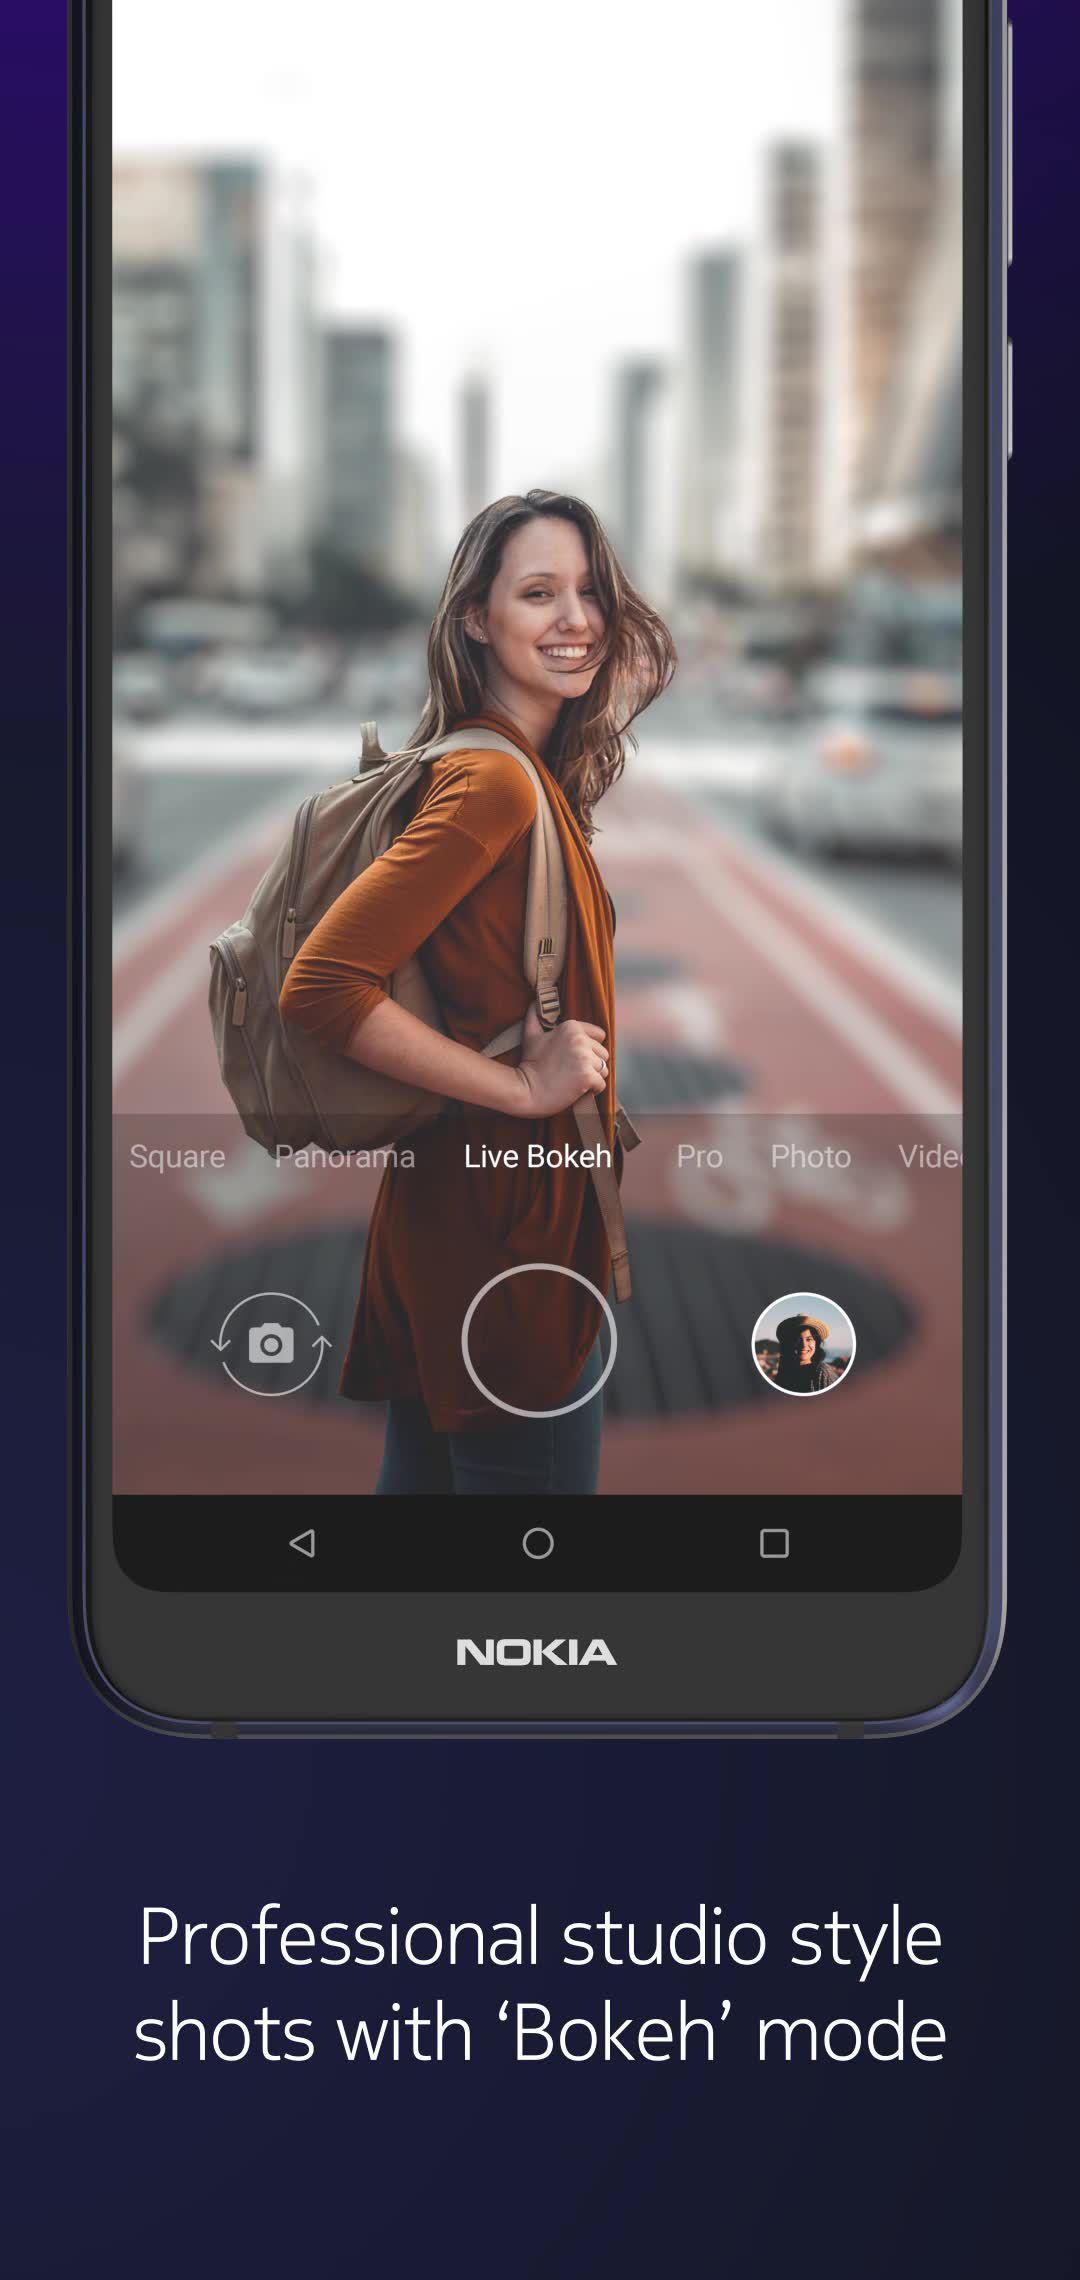 "Nokia 7 1 Smartphone, Android, 5 8"", 4G LTE, SIM Free, 32GB, Blue"